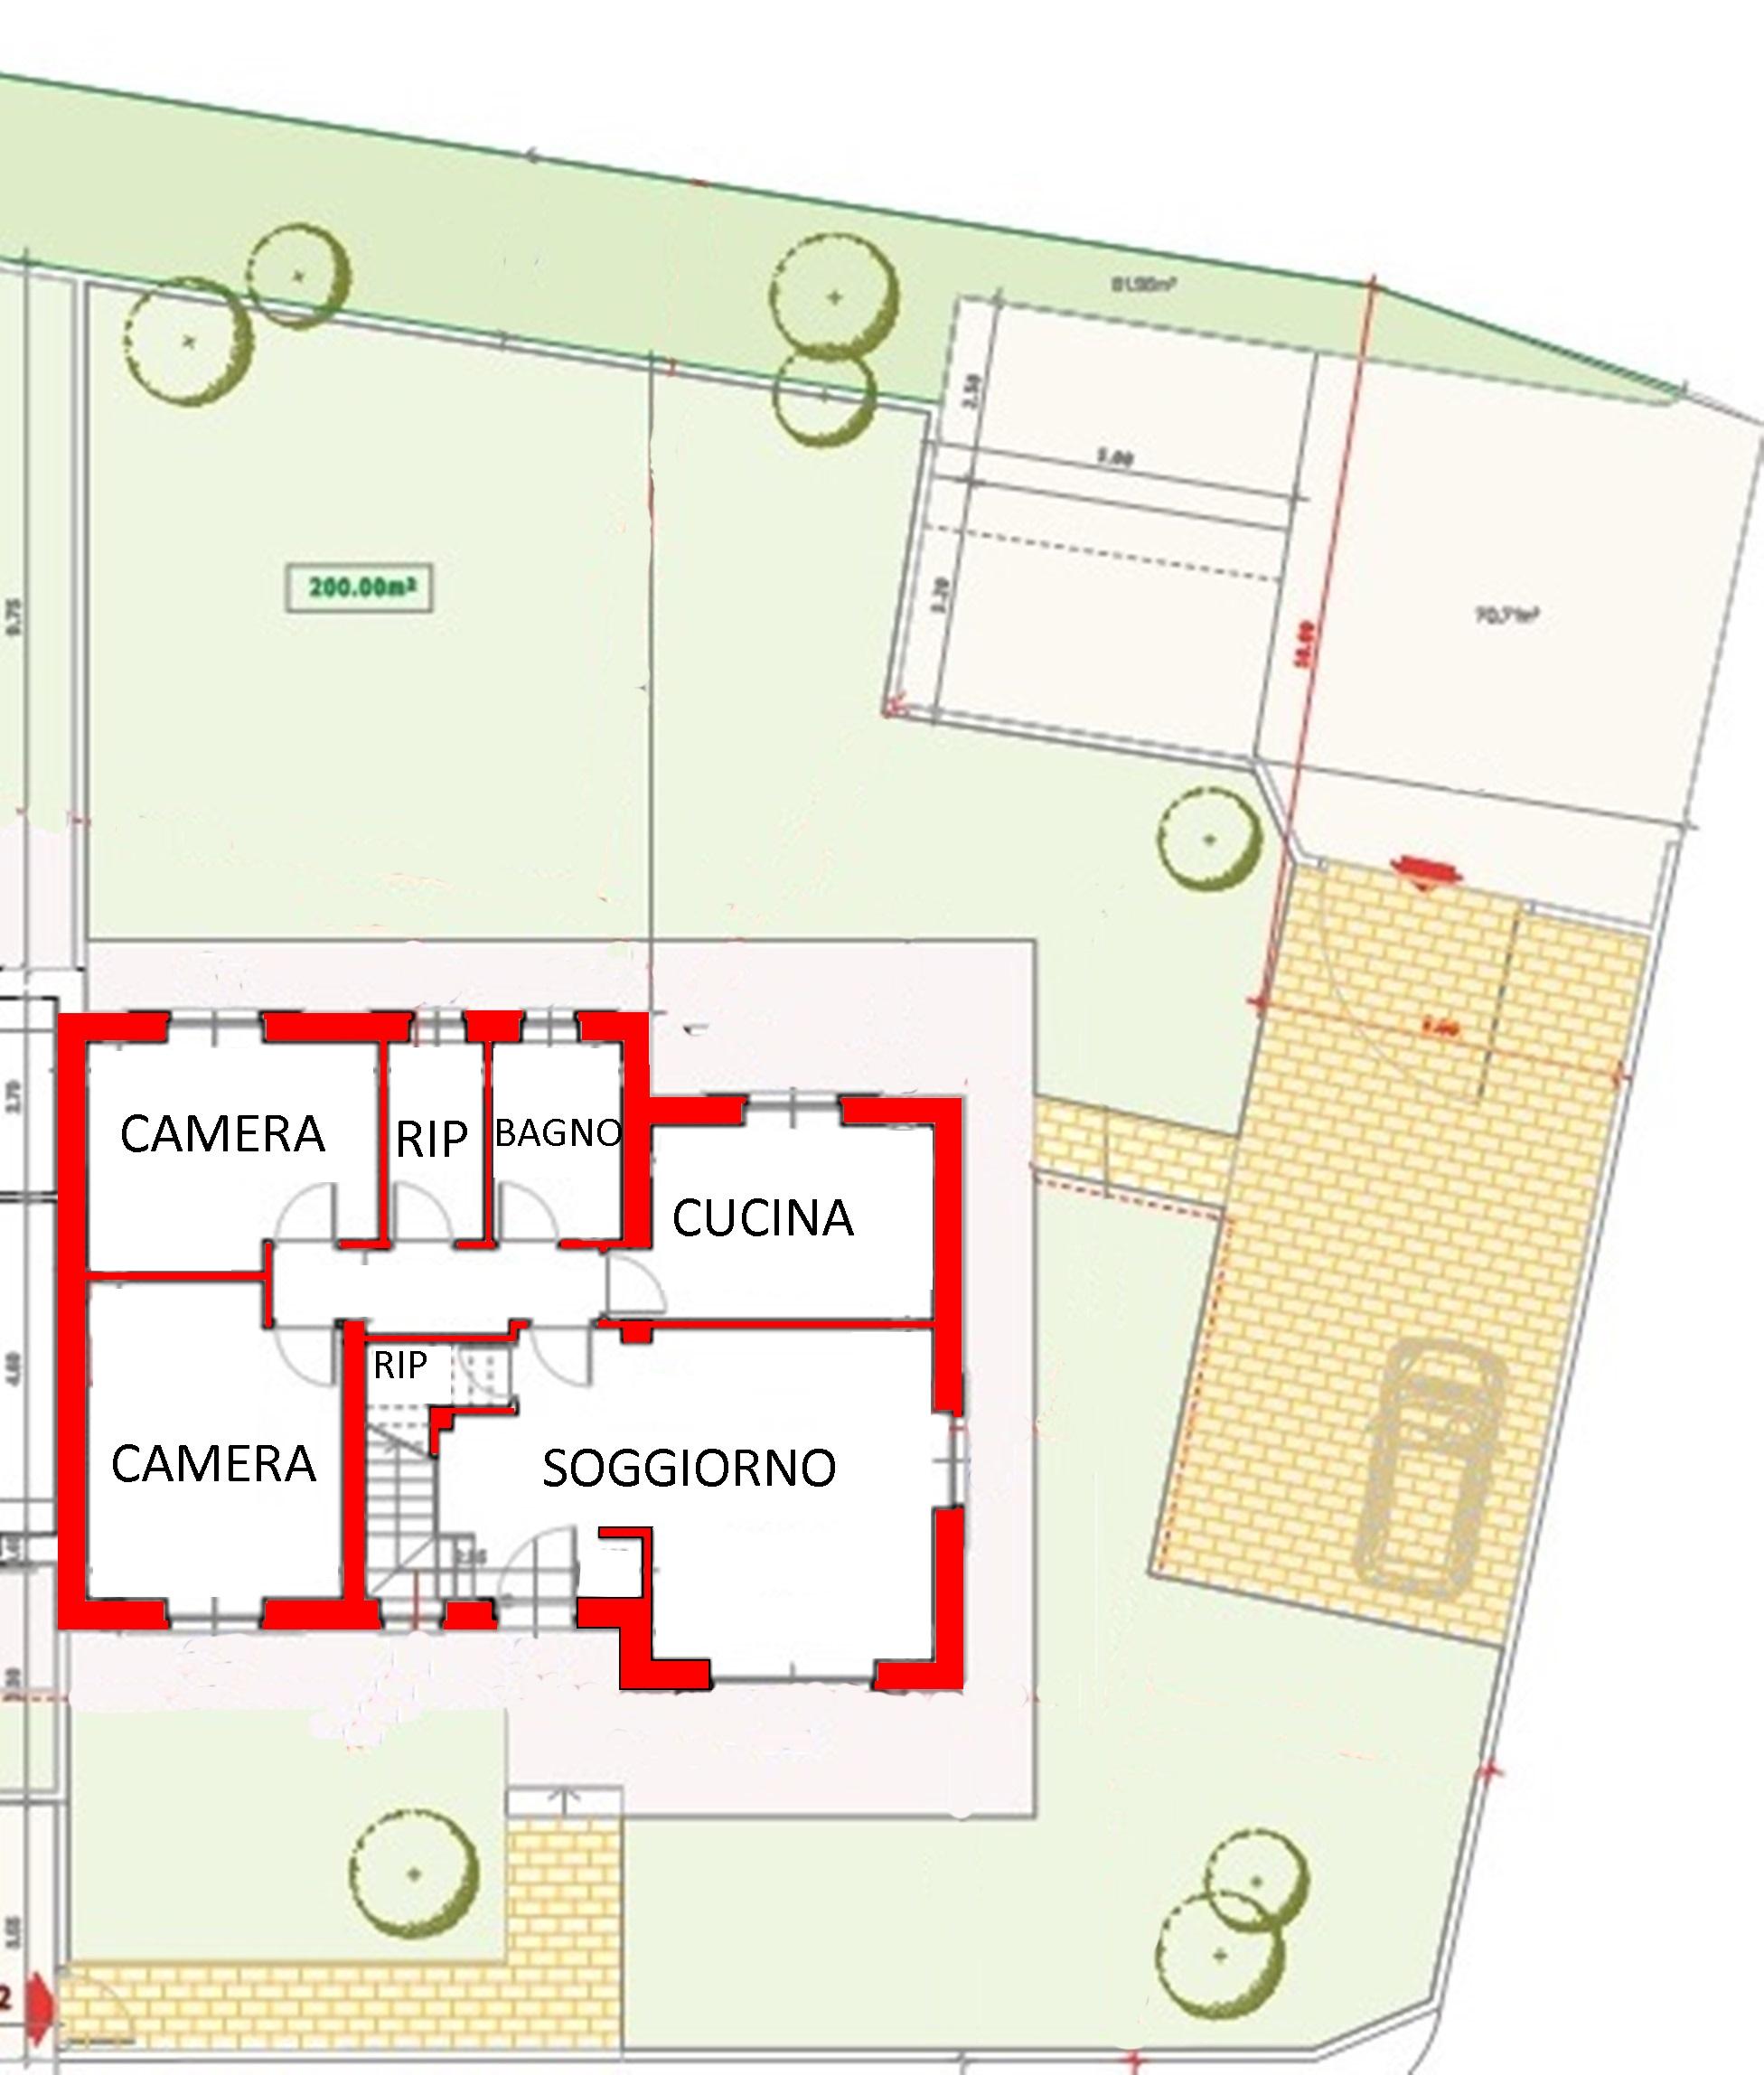 Terreno edif. residenziale in vendita, rif. 01073/9 (Planimetria 1/3)